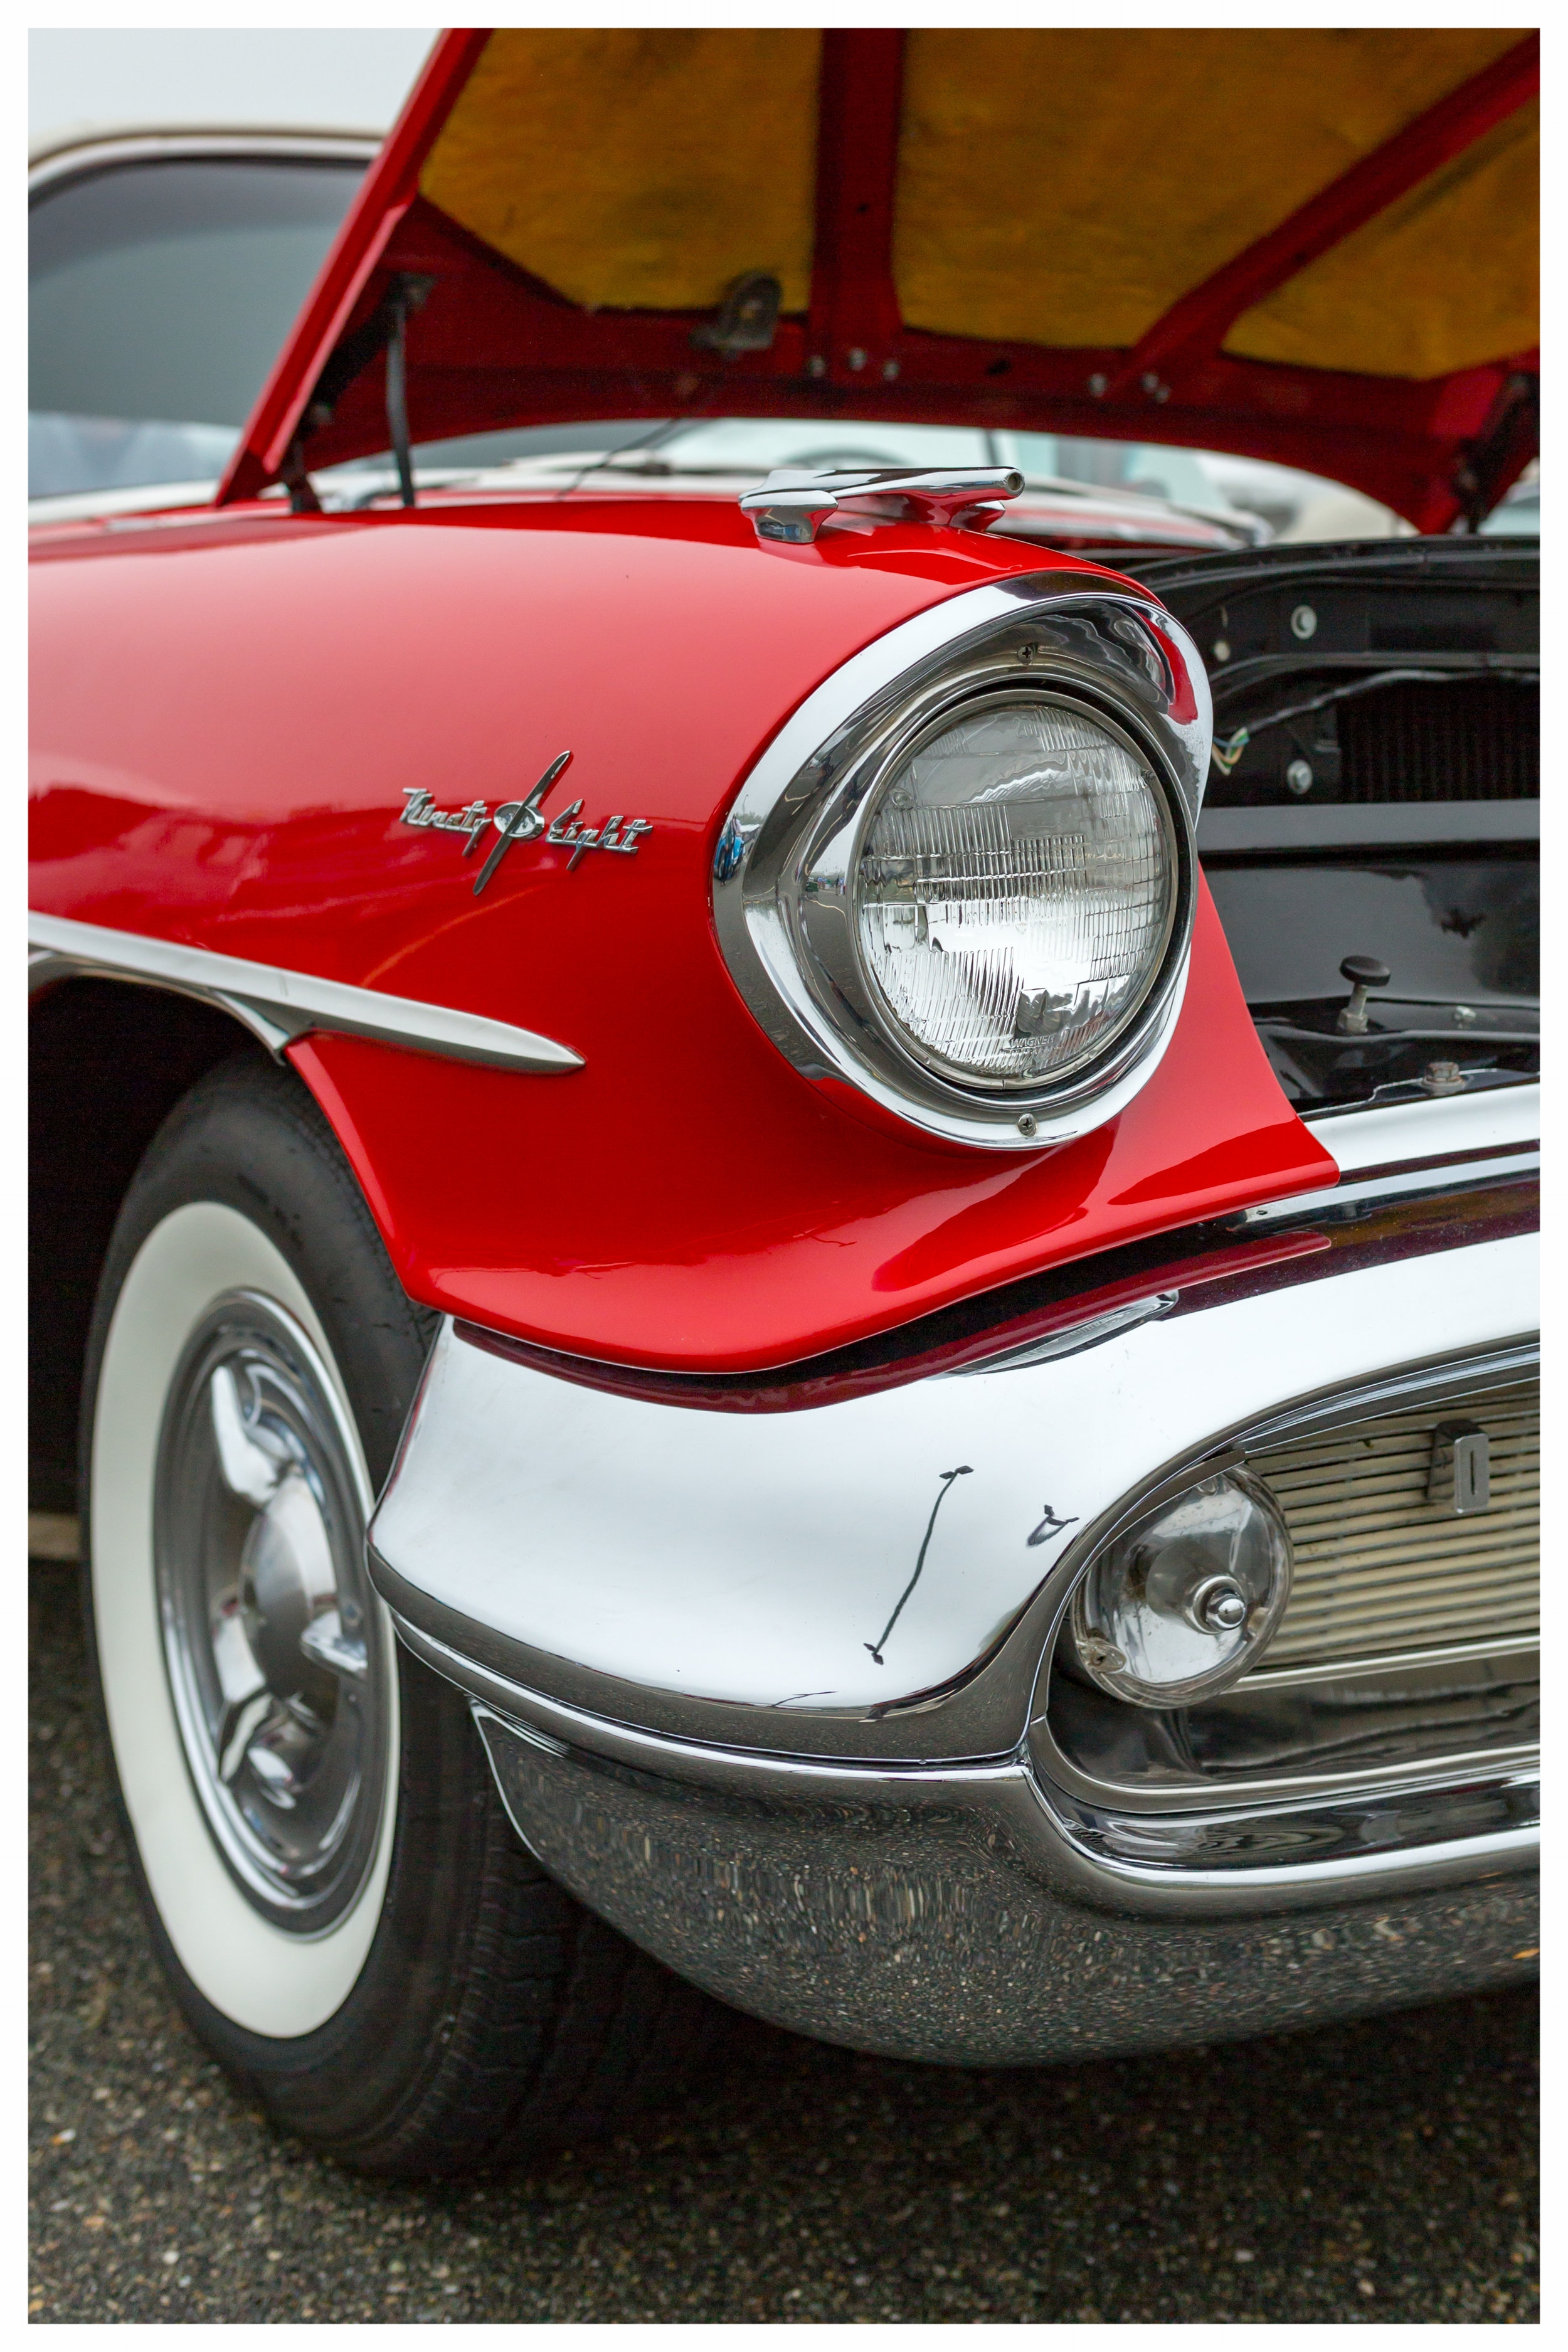 Barrett Jackson Car Show-3.jpg